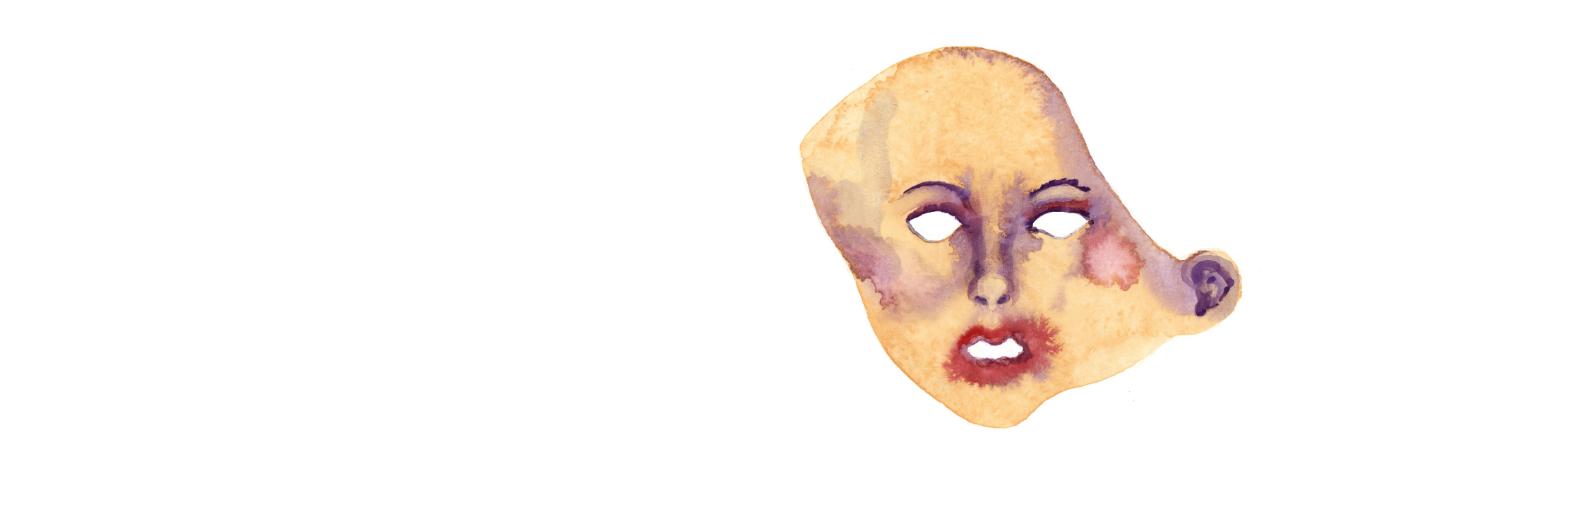 sex-doll-1_Illustratsioon Andrei Kedrin_highlightiks2